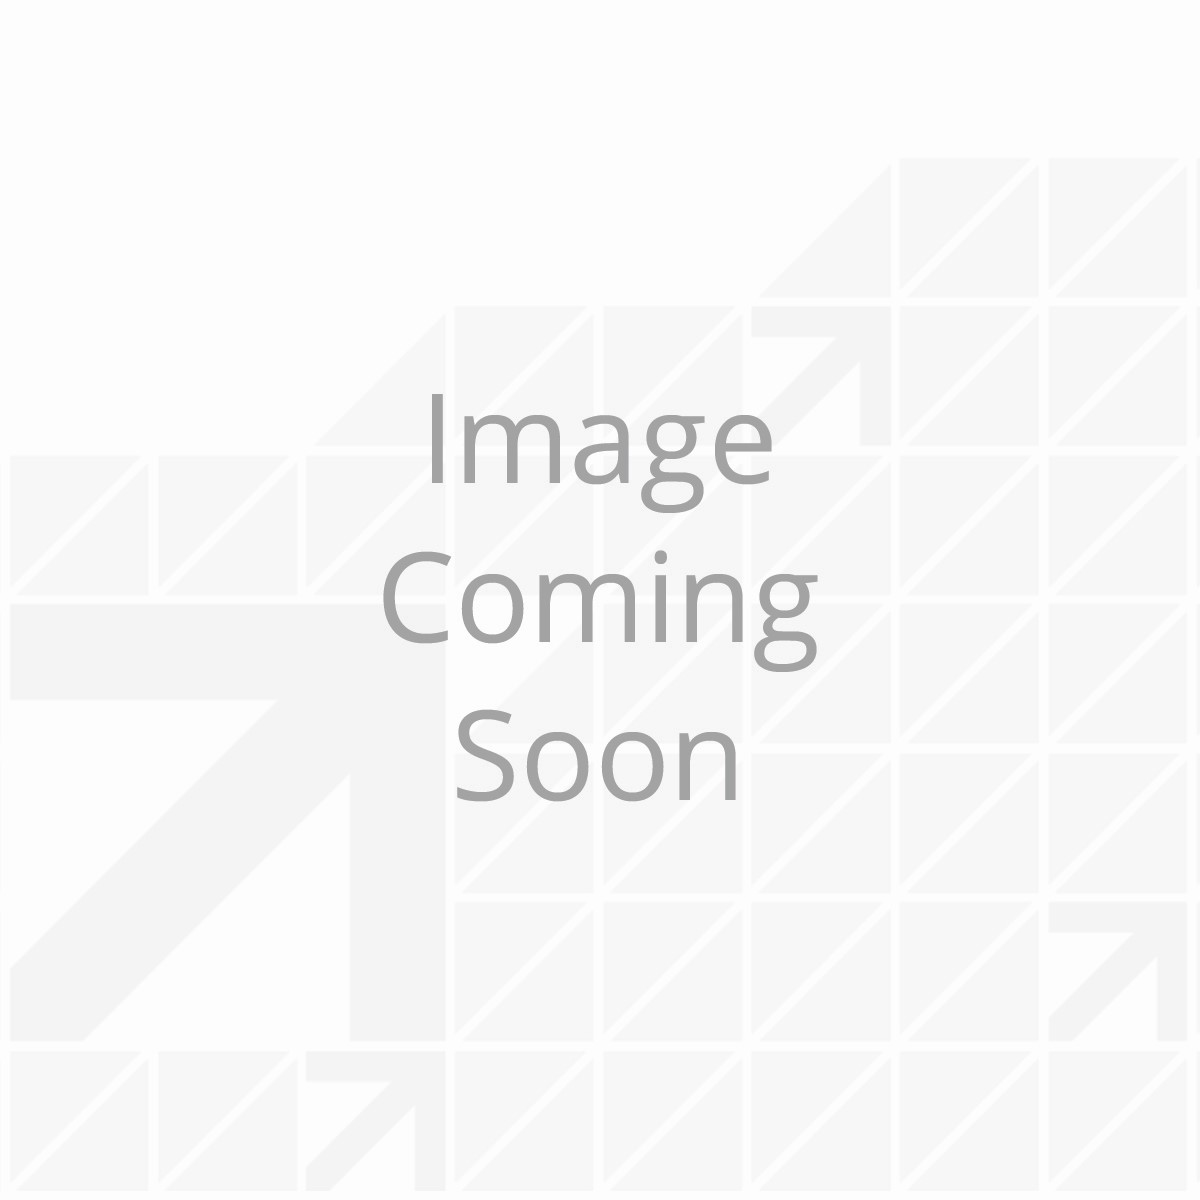 "Spyder 5th Wheel Rail Gooseneck Hitch with 2-5/16"" Ball, 25K"